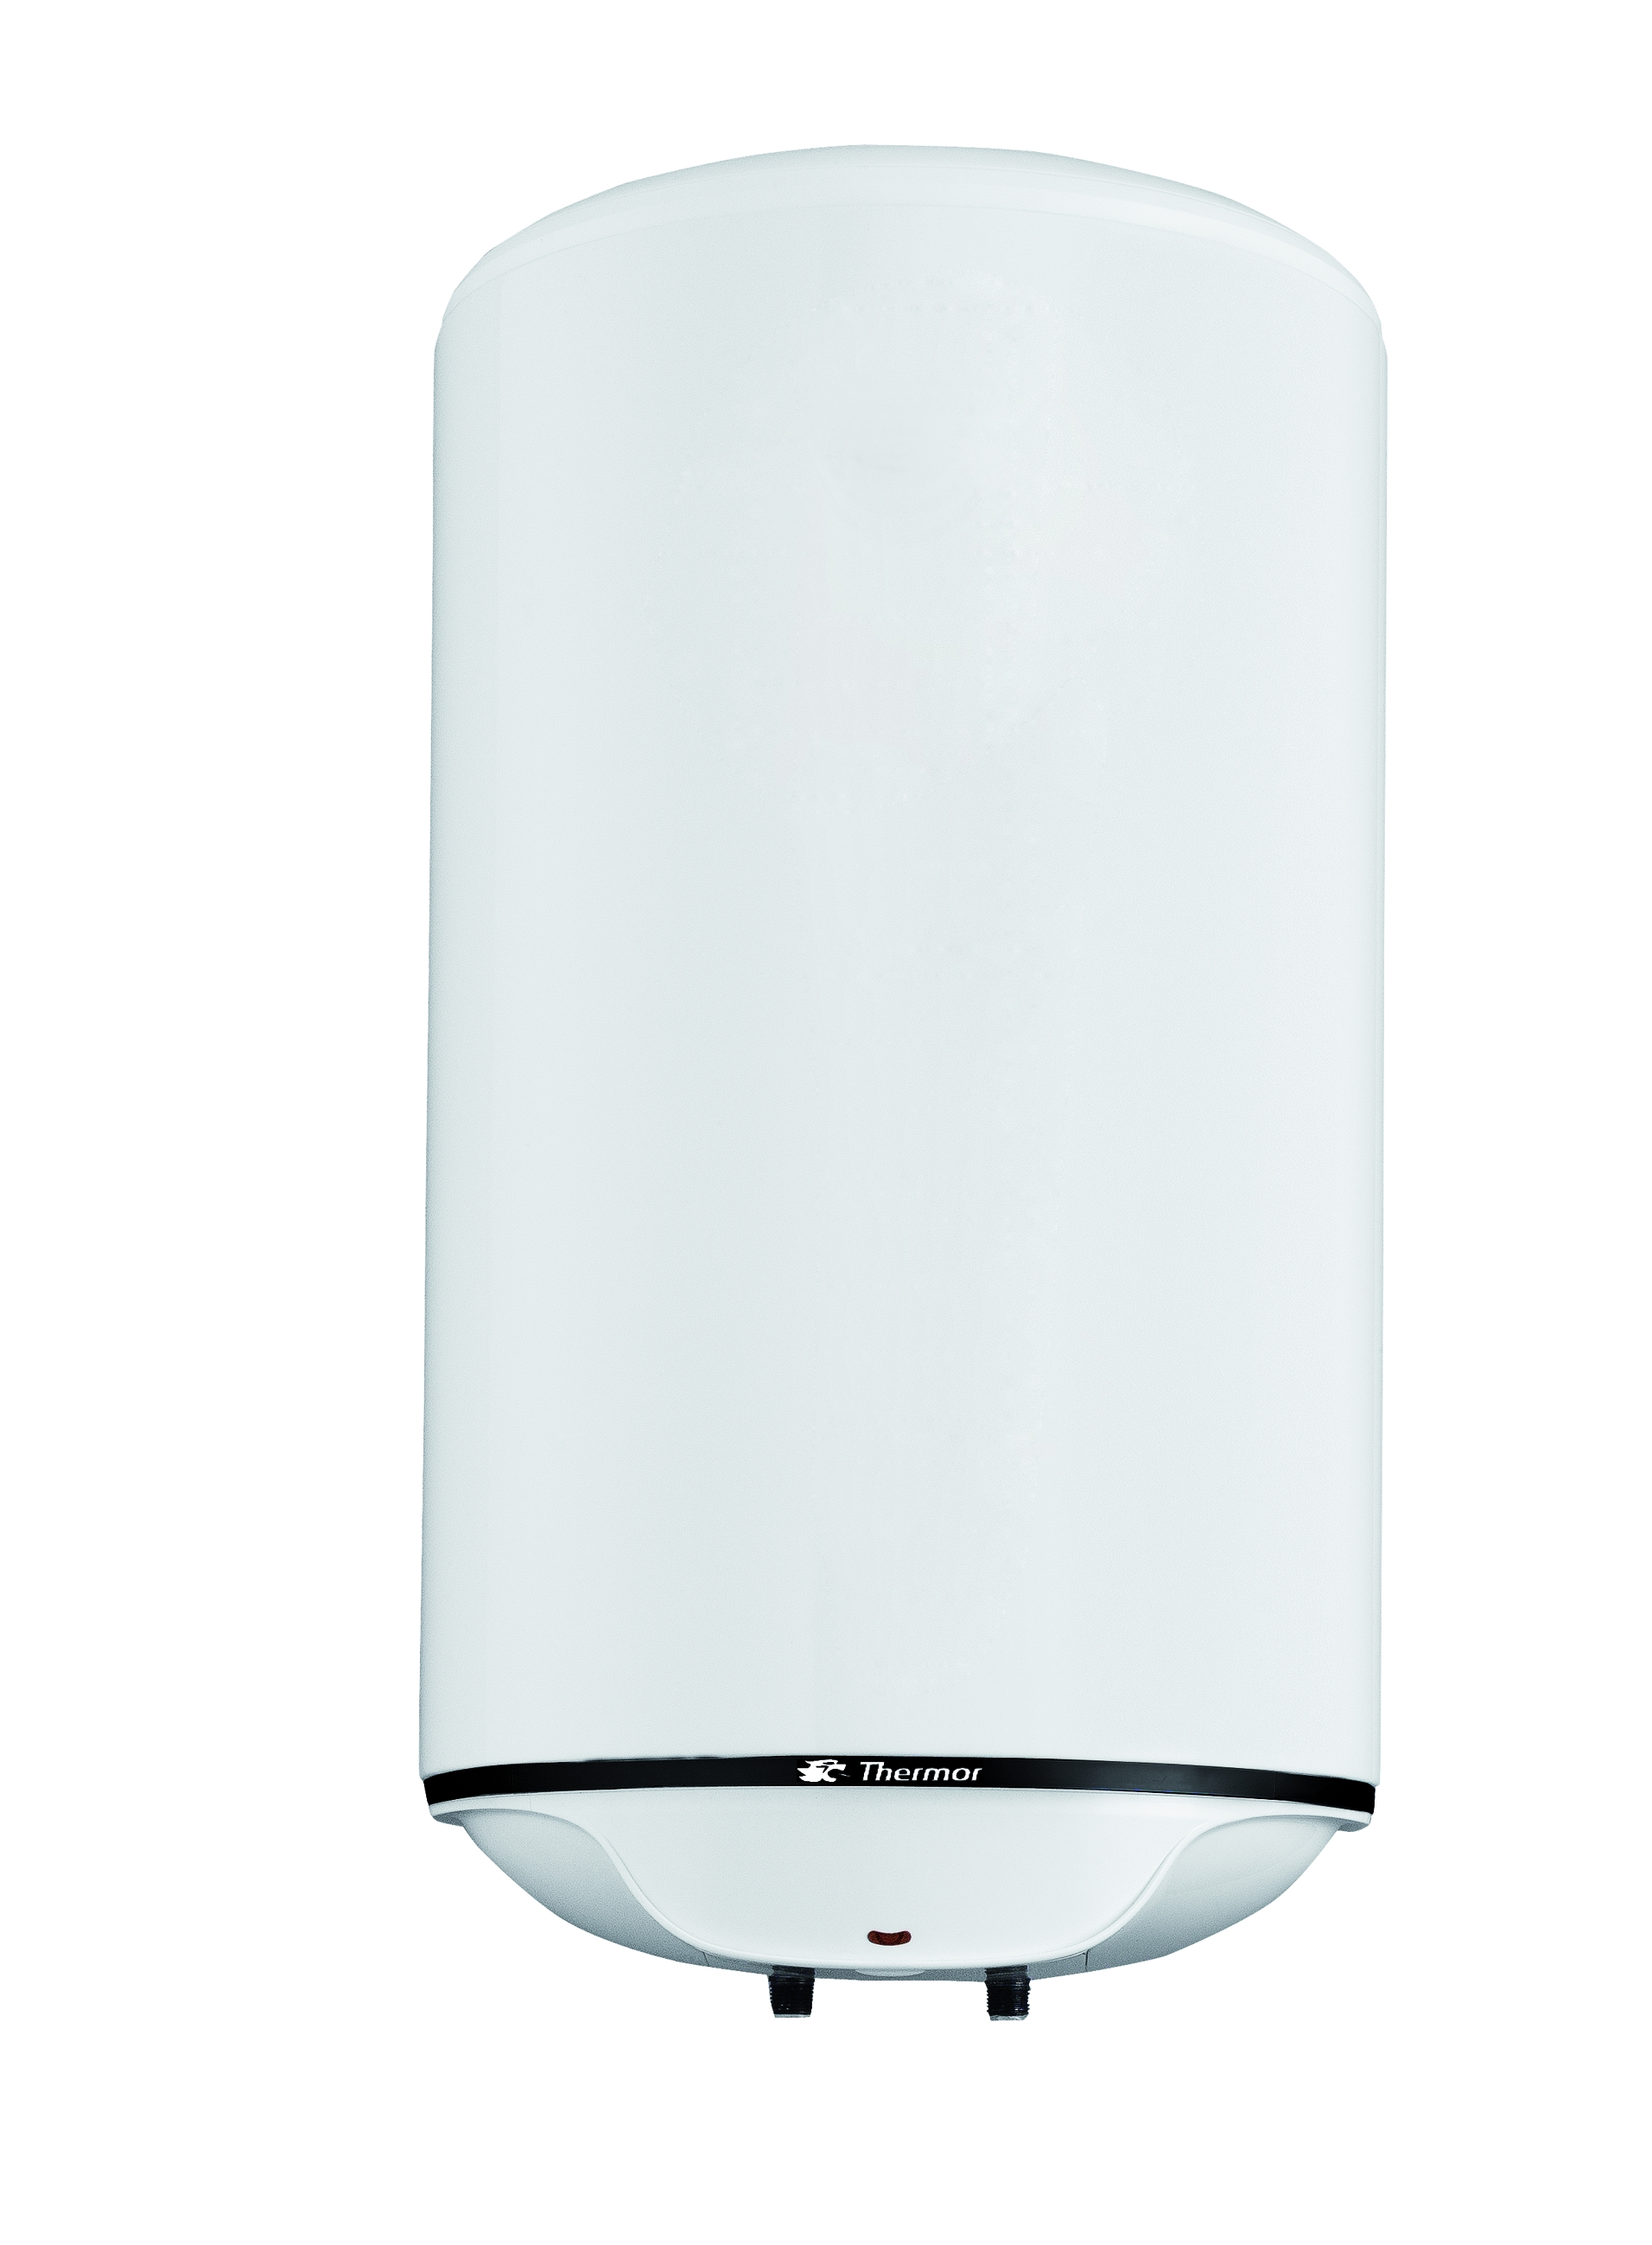 Termo el ctrico thermor concept 50l v compra en - Termo electrico 50l ...